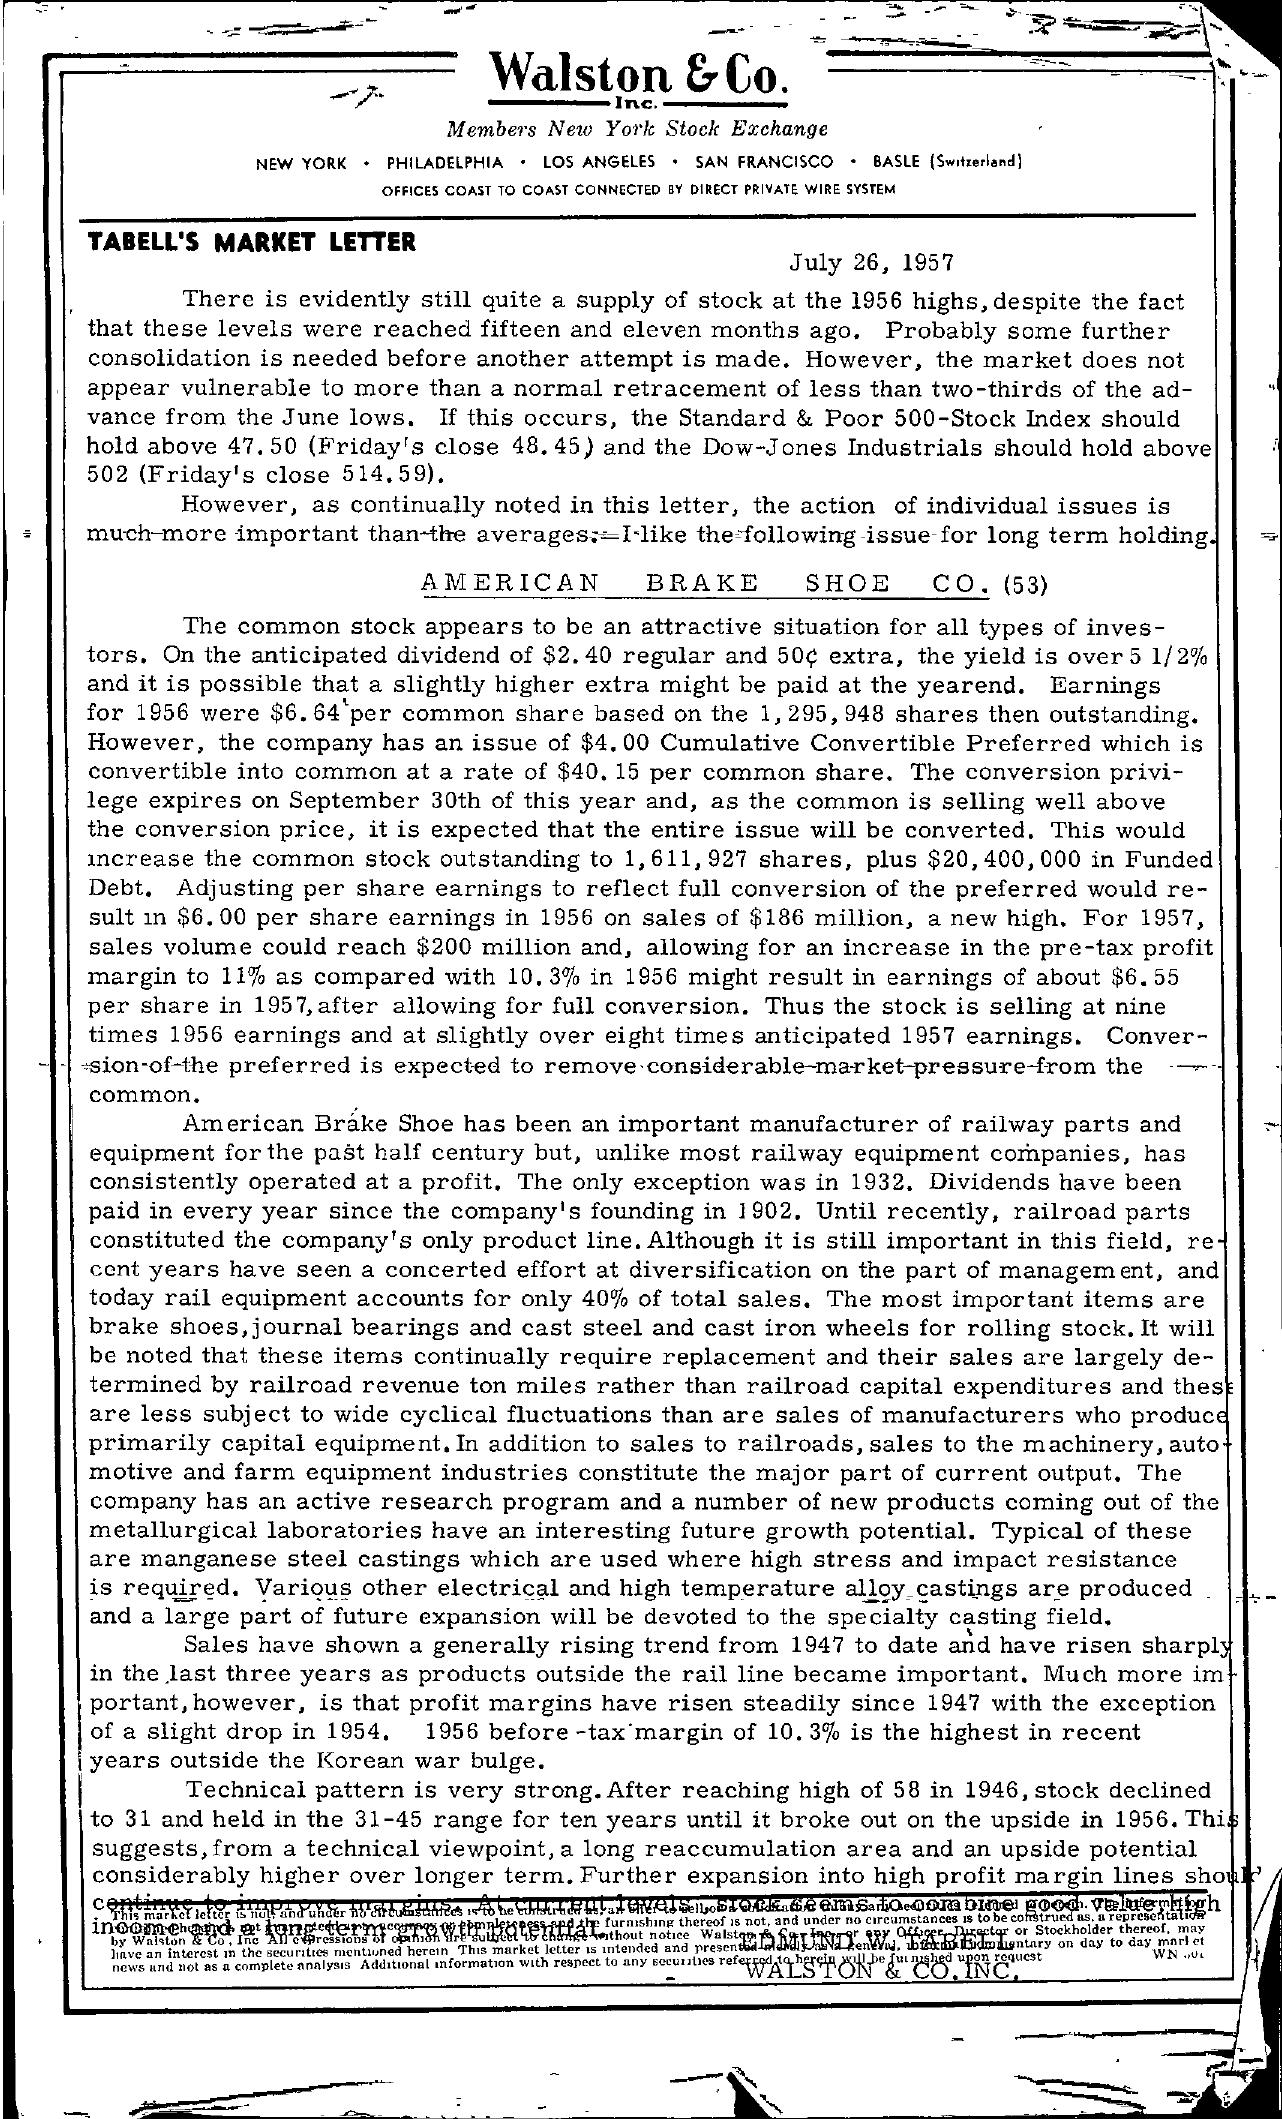 Tabell's Market Letter - July 26, 1957